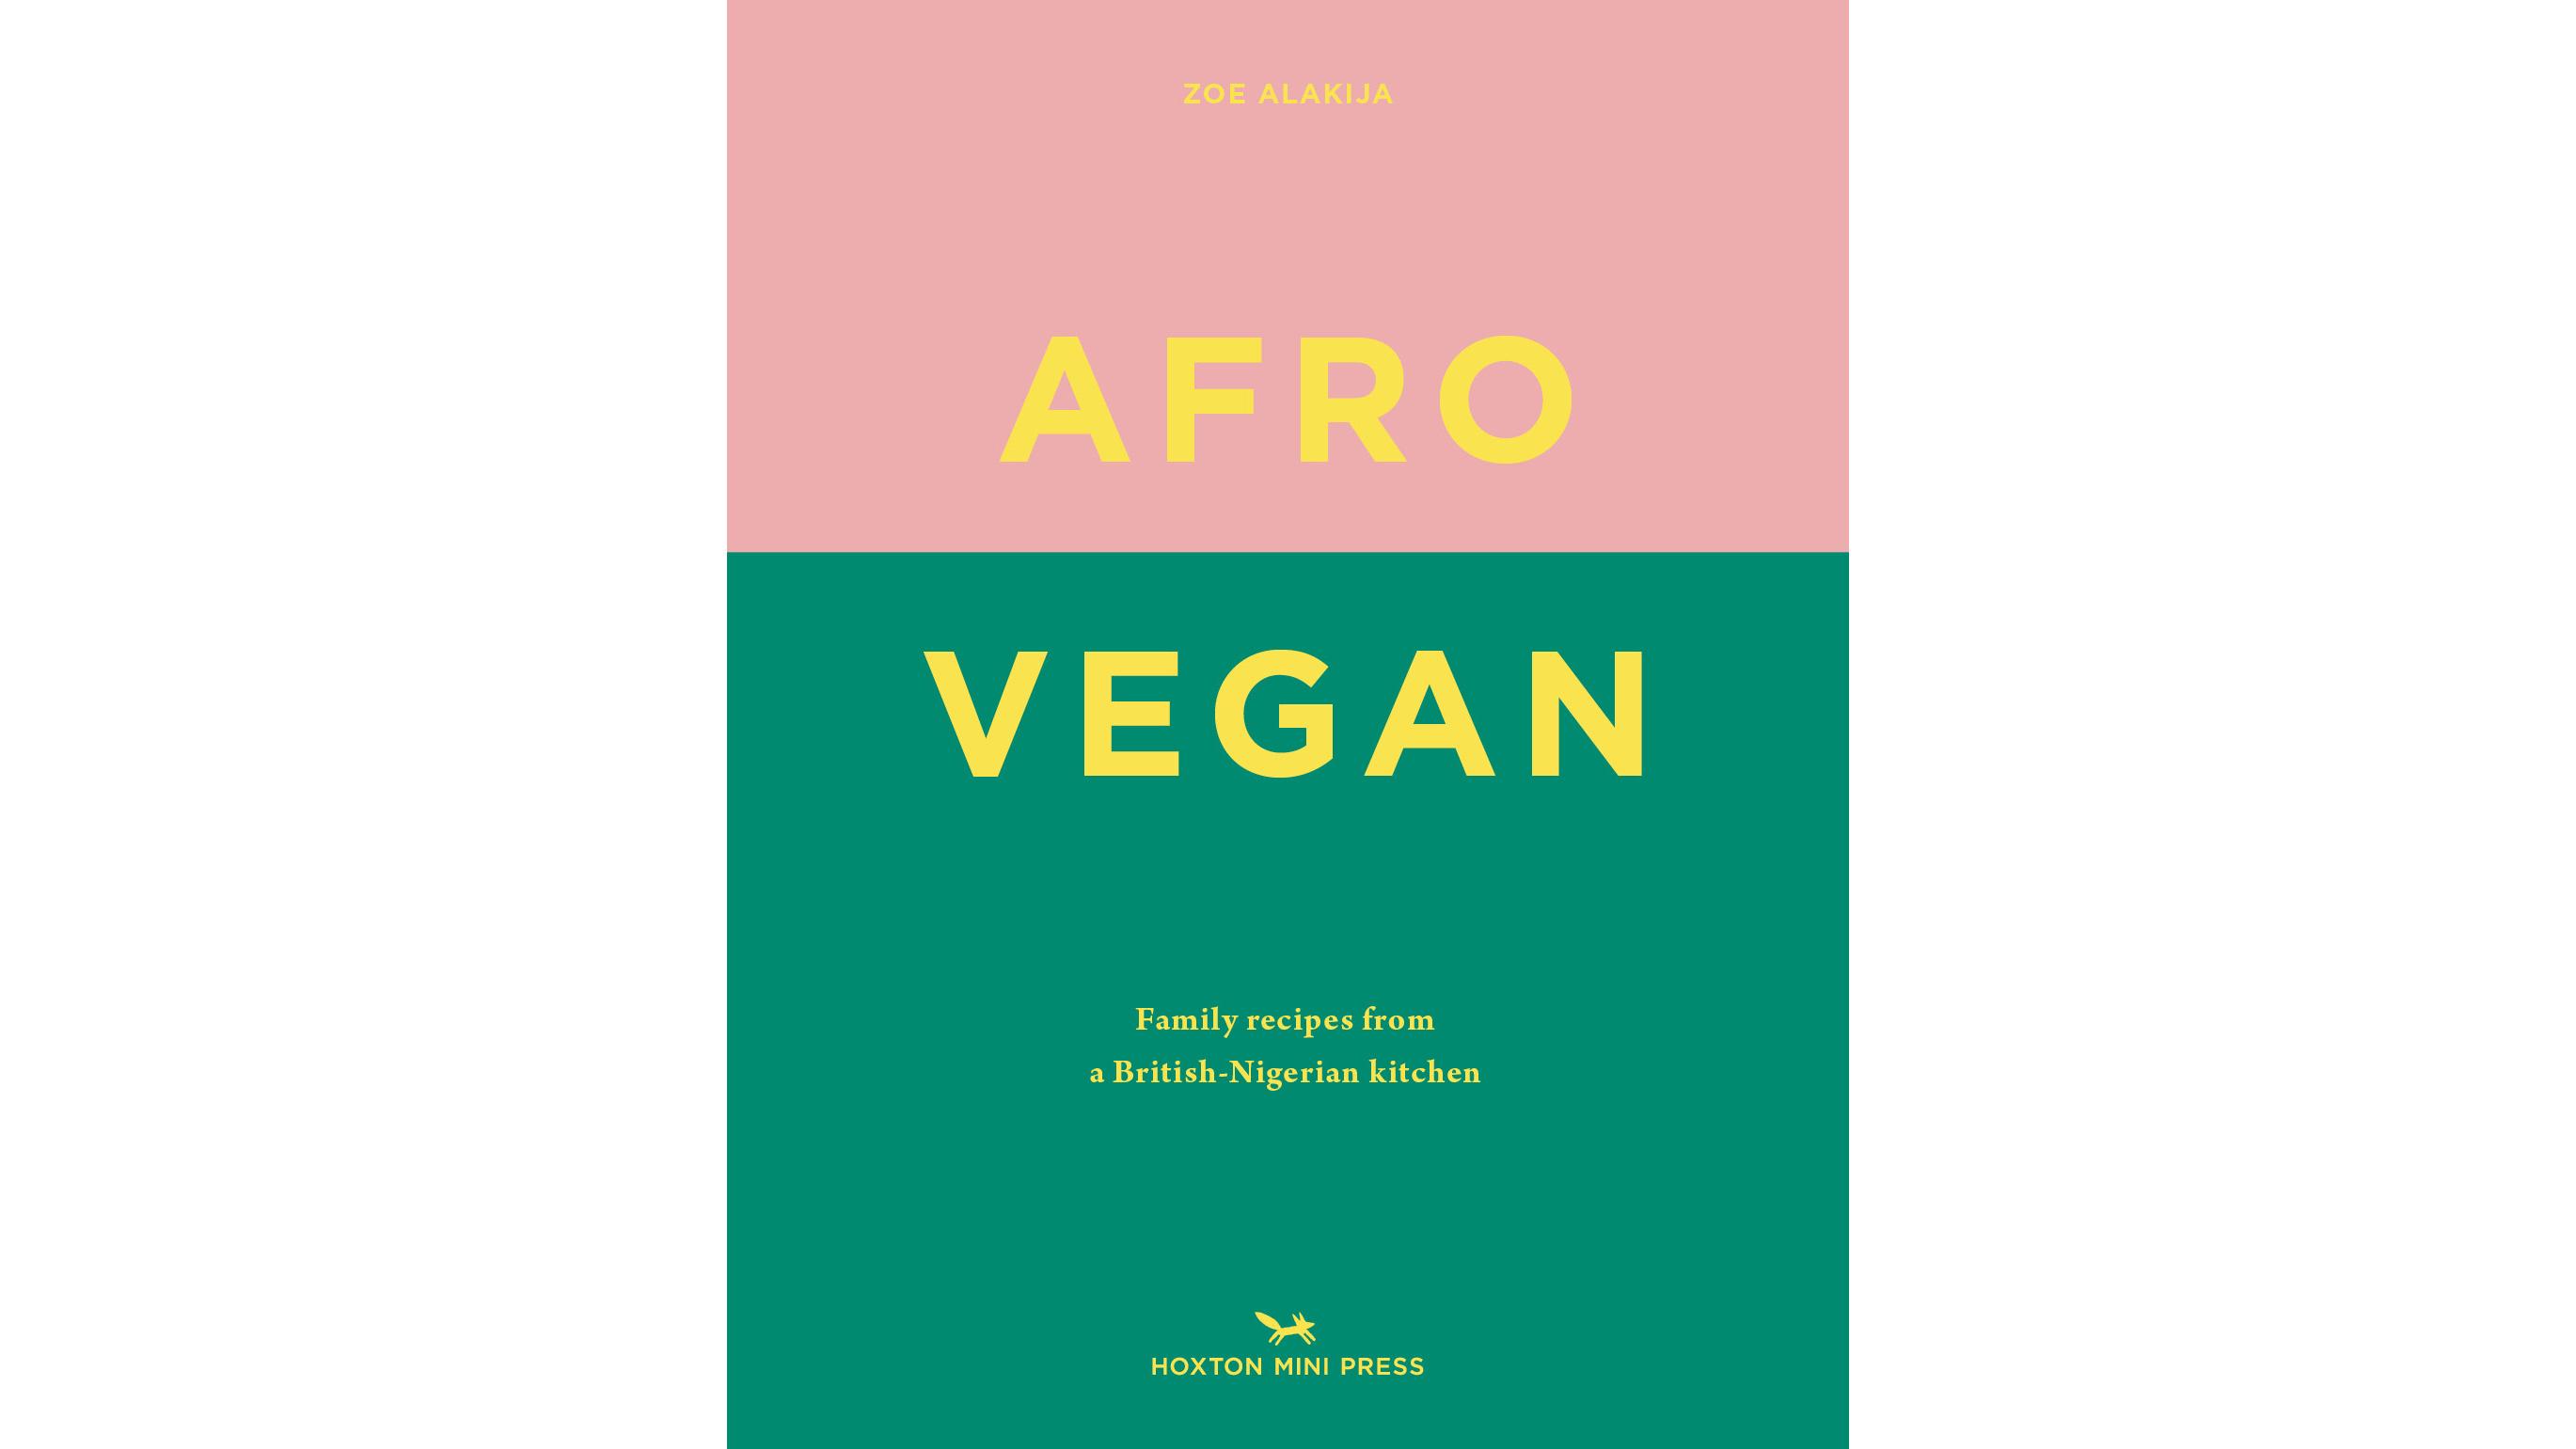 Afro Vegan by Zoe Alakija